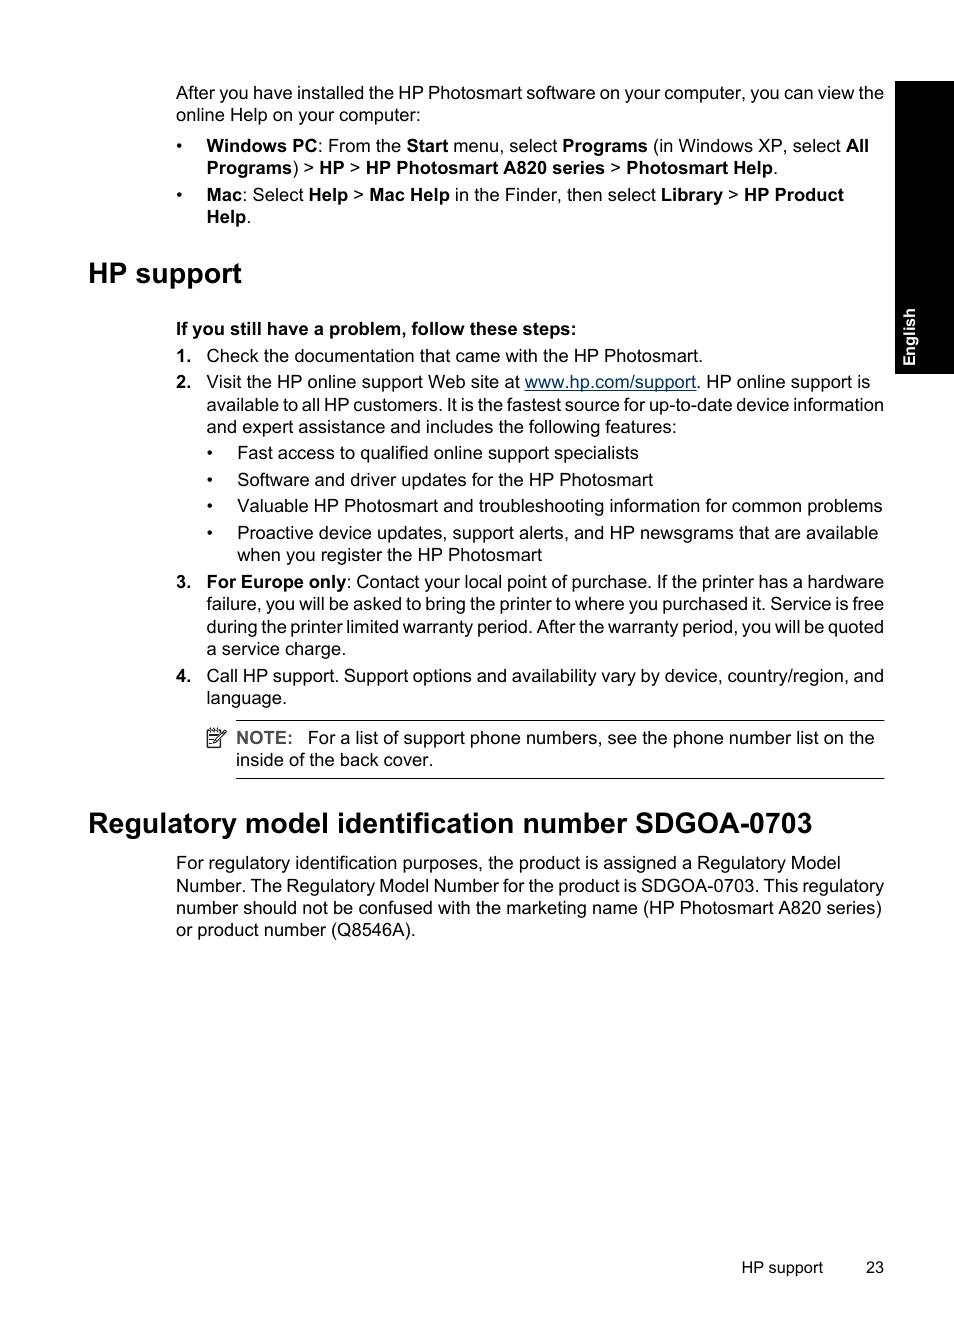 Hp support, Regulatory model identification number sdgoa